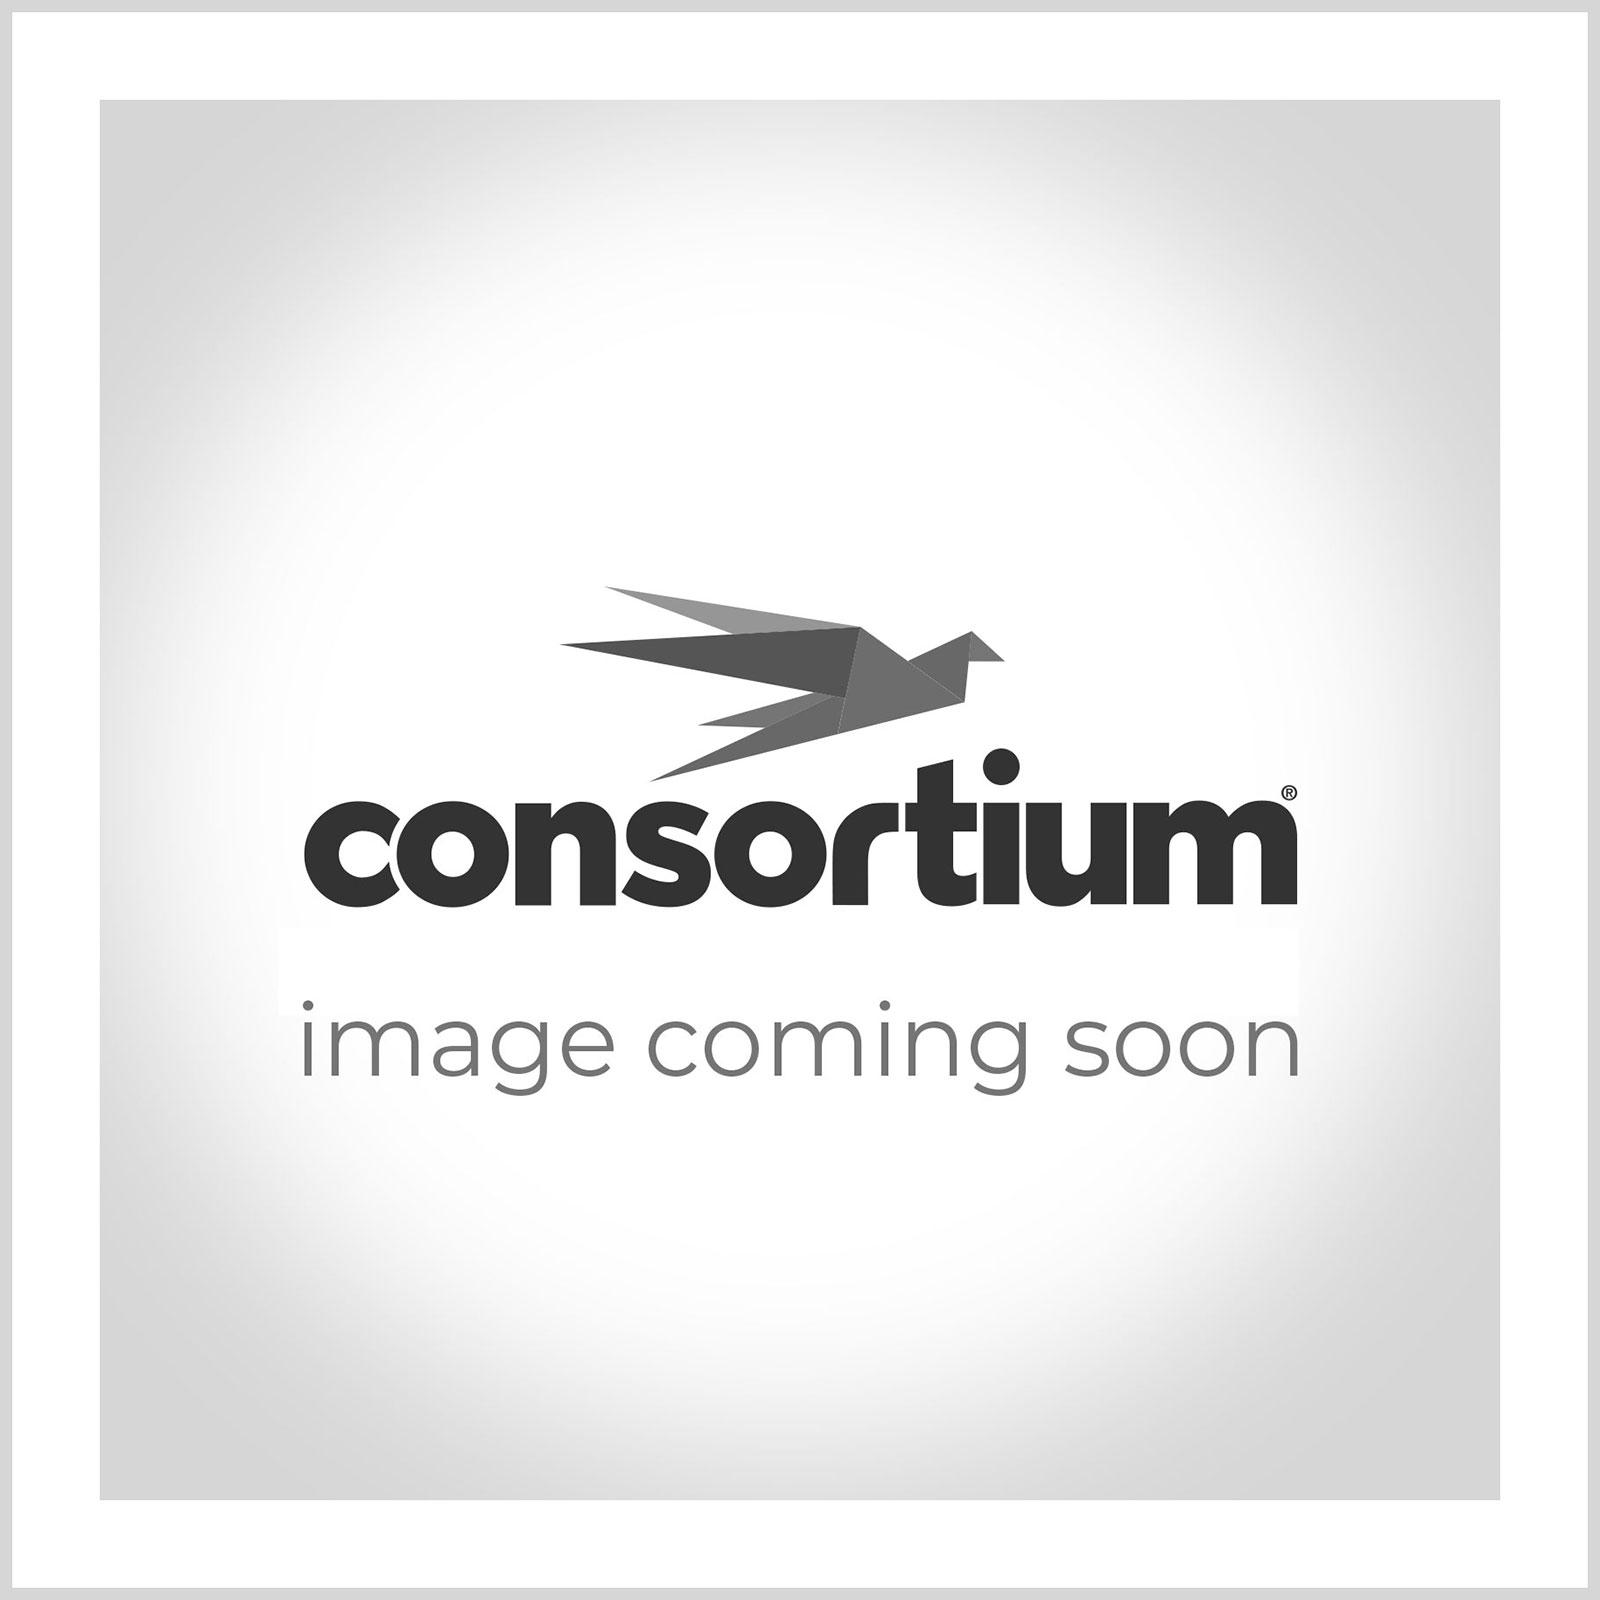 Consortium Wireless Keyboard